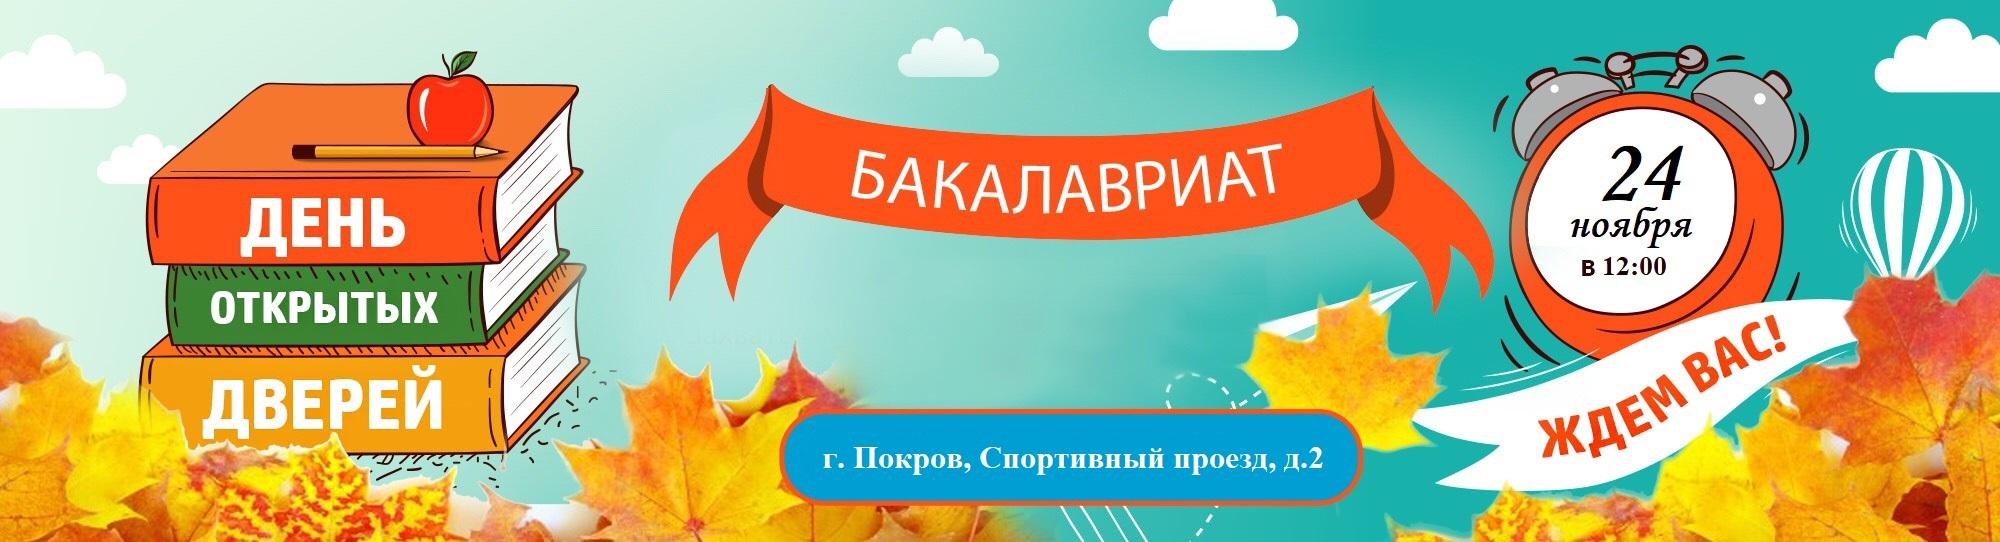 banner-dod-pokrov